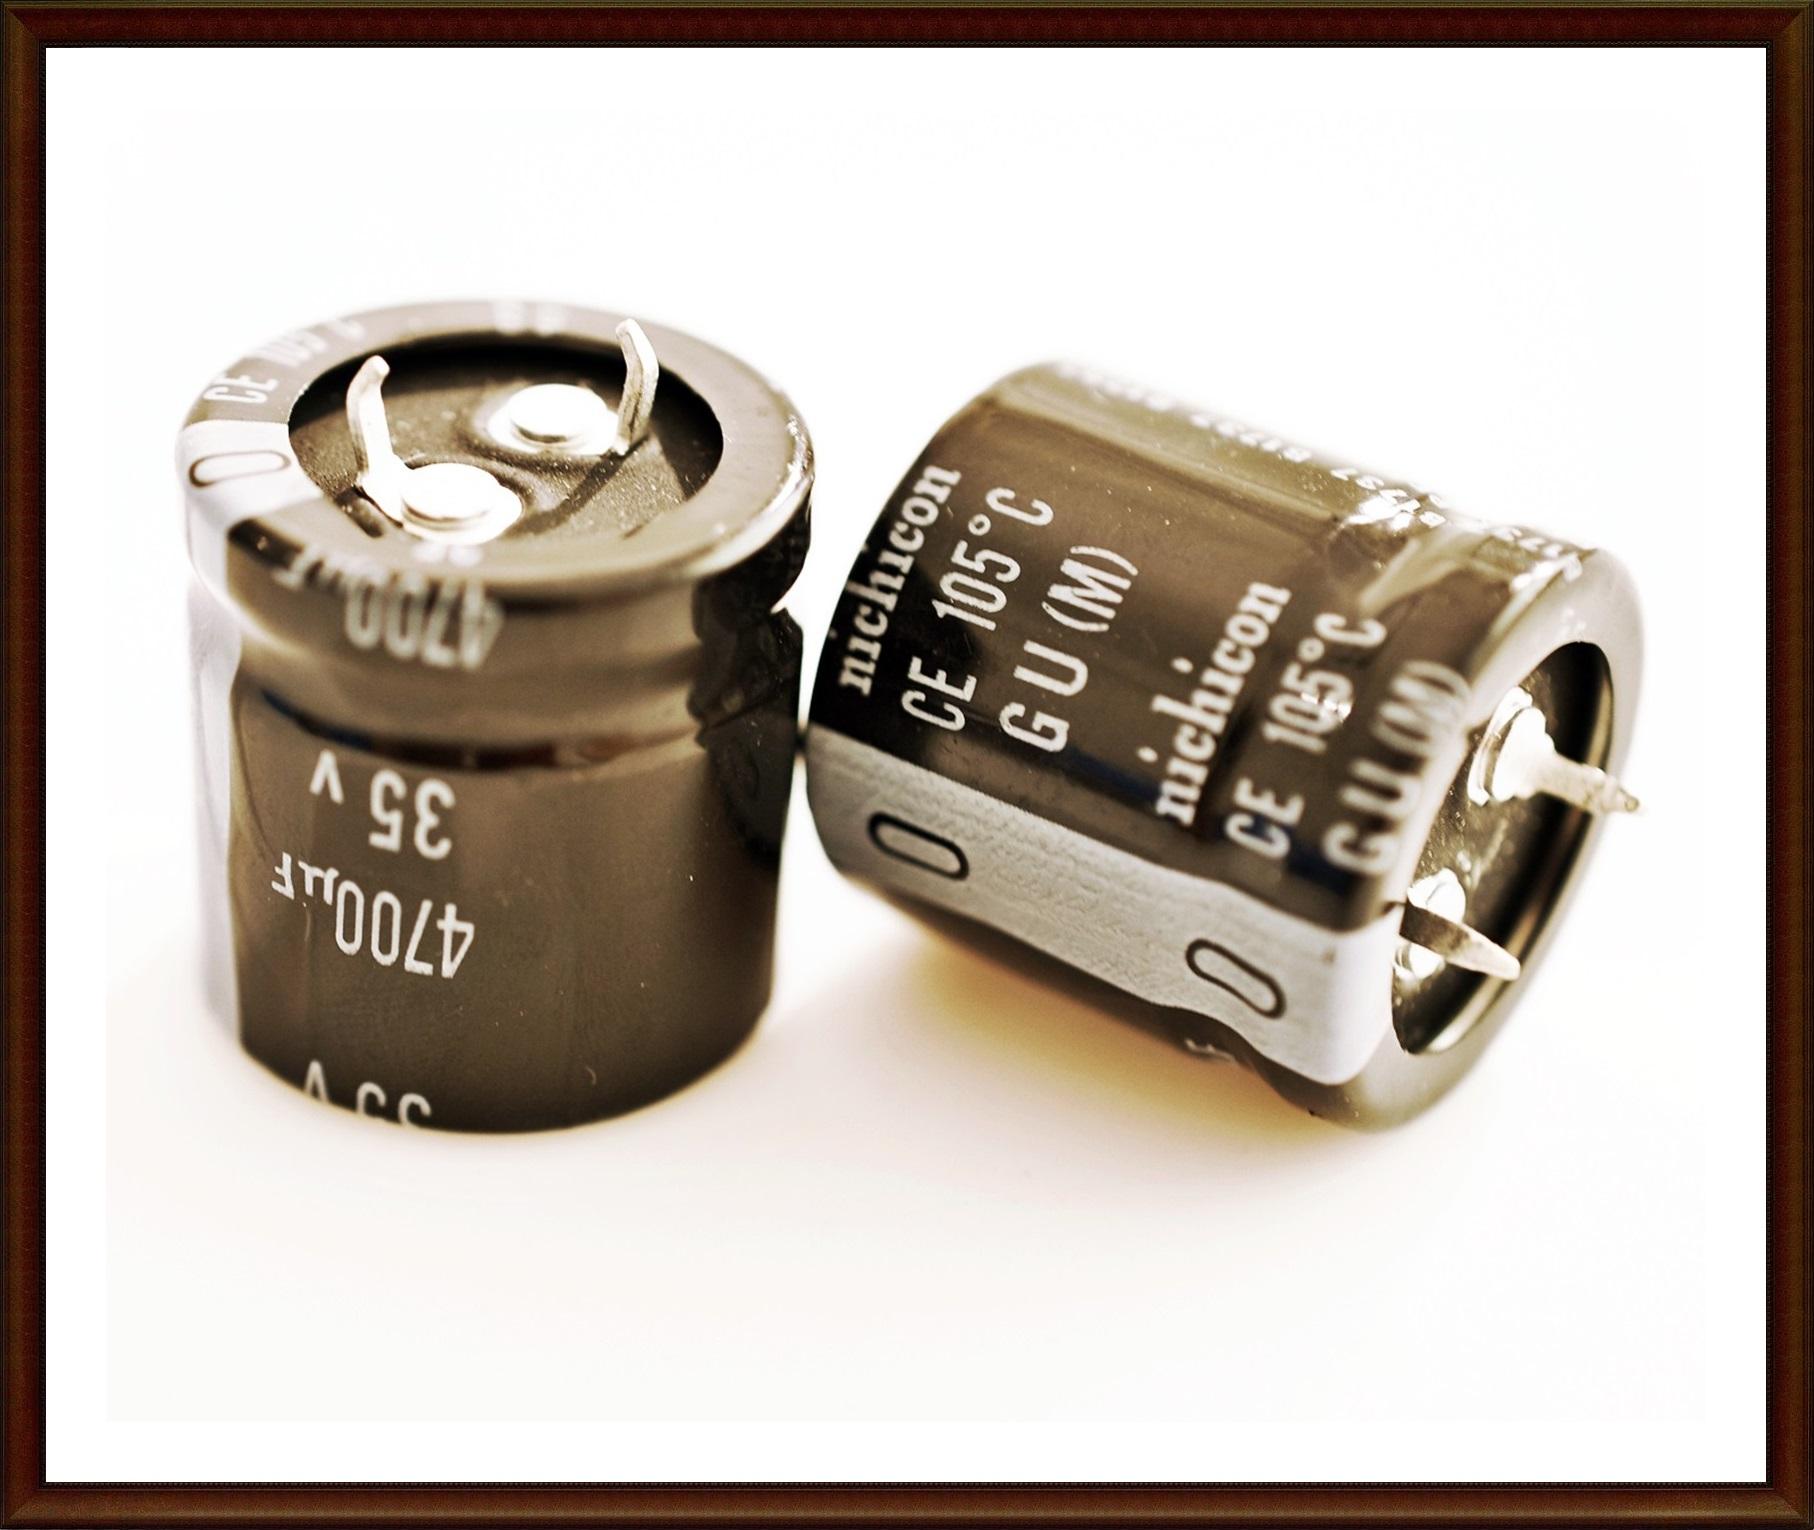 Kondensator Elko 4700µF 35V 25X25mm 85° RM10mm 2 Stück